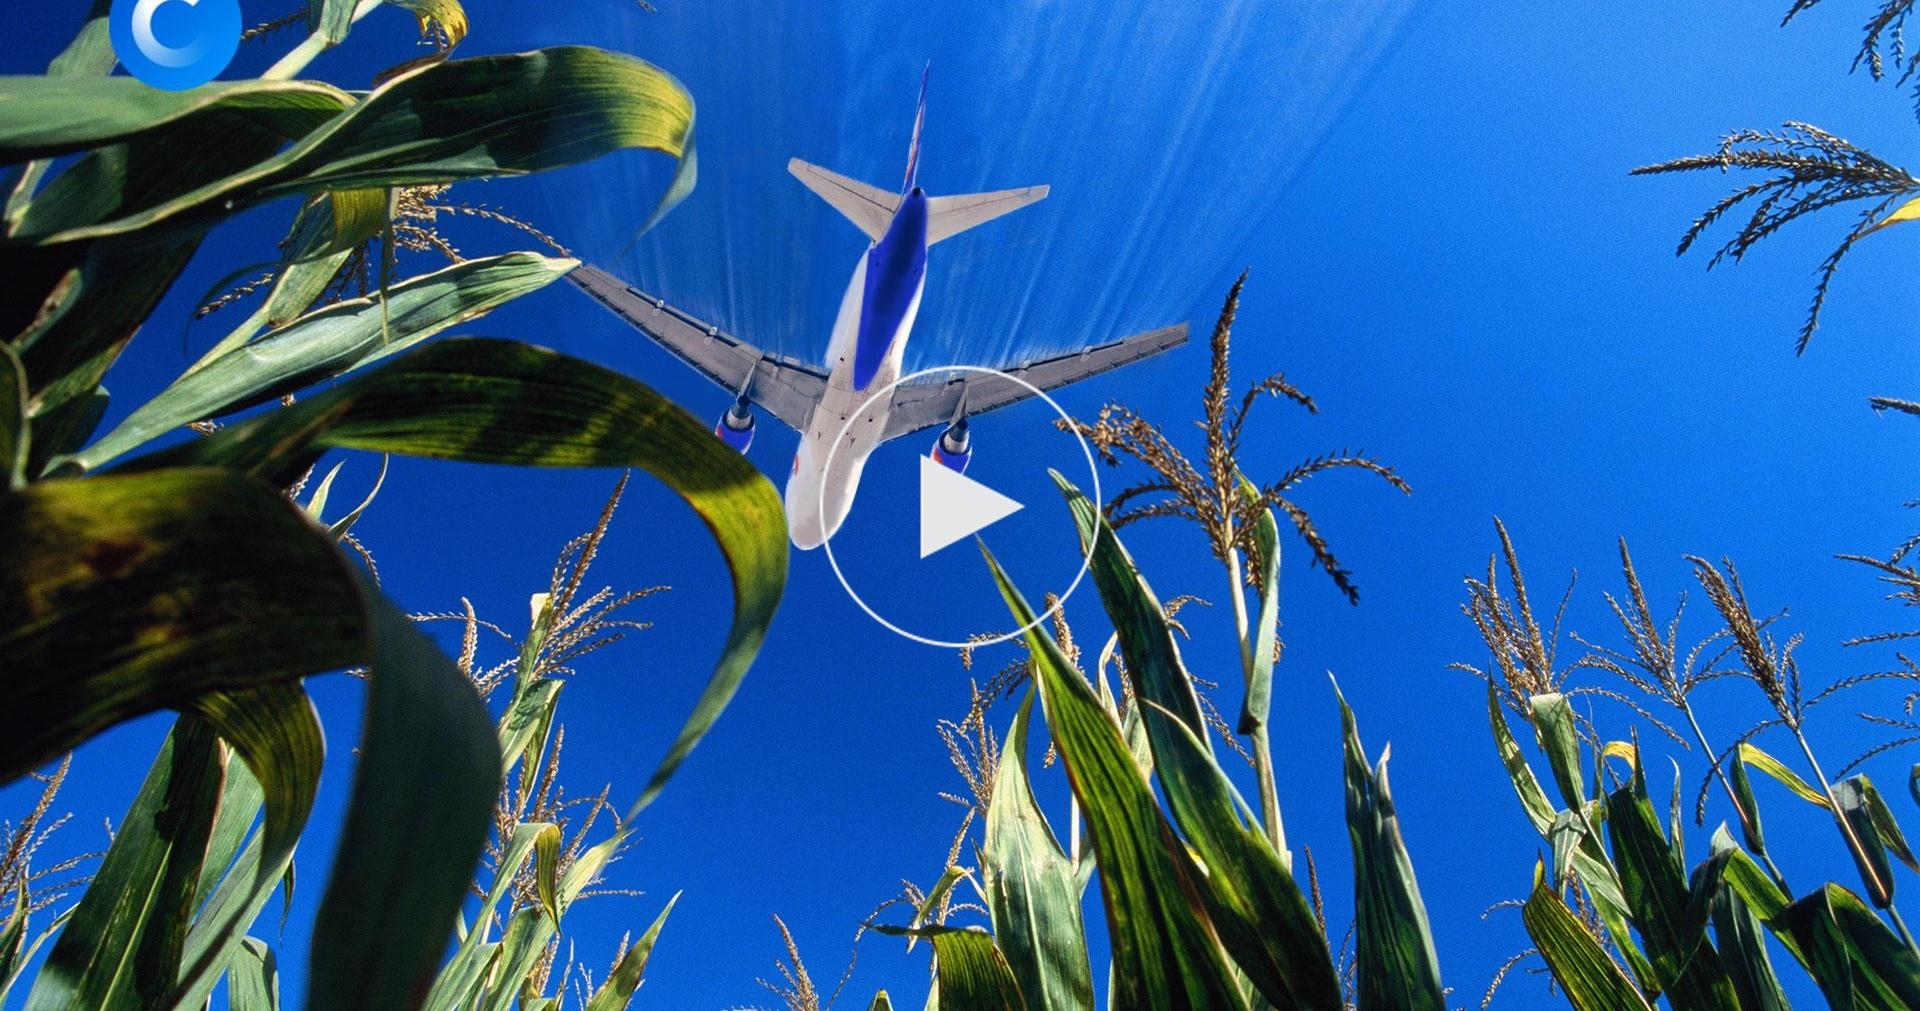 Посадка вкукурузу: годовщина аварии А321